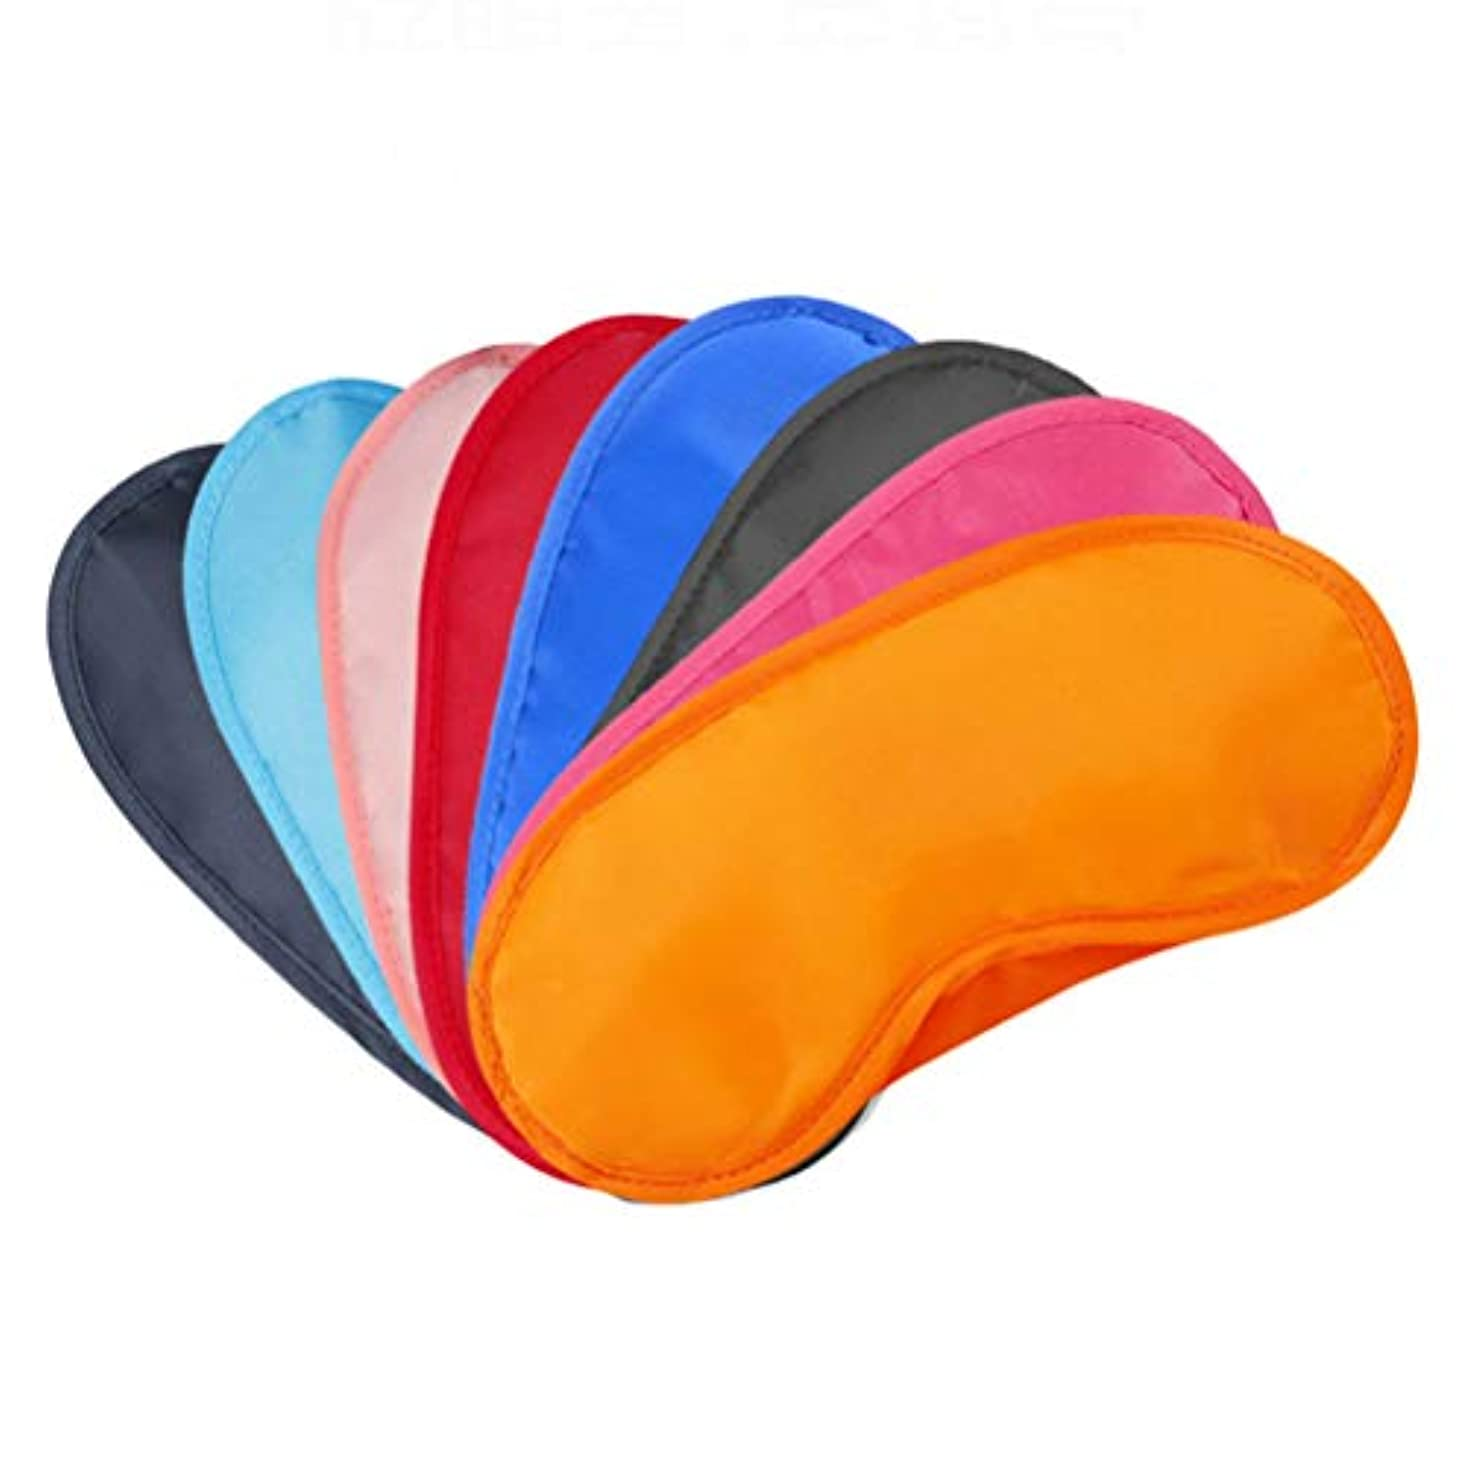 Lurrose 30ピースコットンアイスリーピングマスクレストアイマスク目隠し旅行用睡眠補助剤(混色)